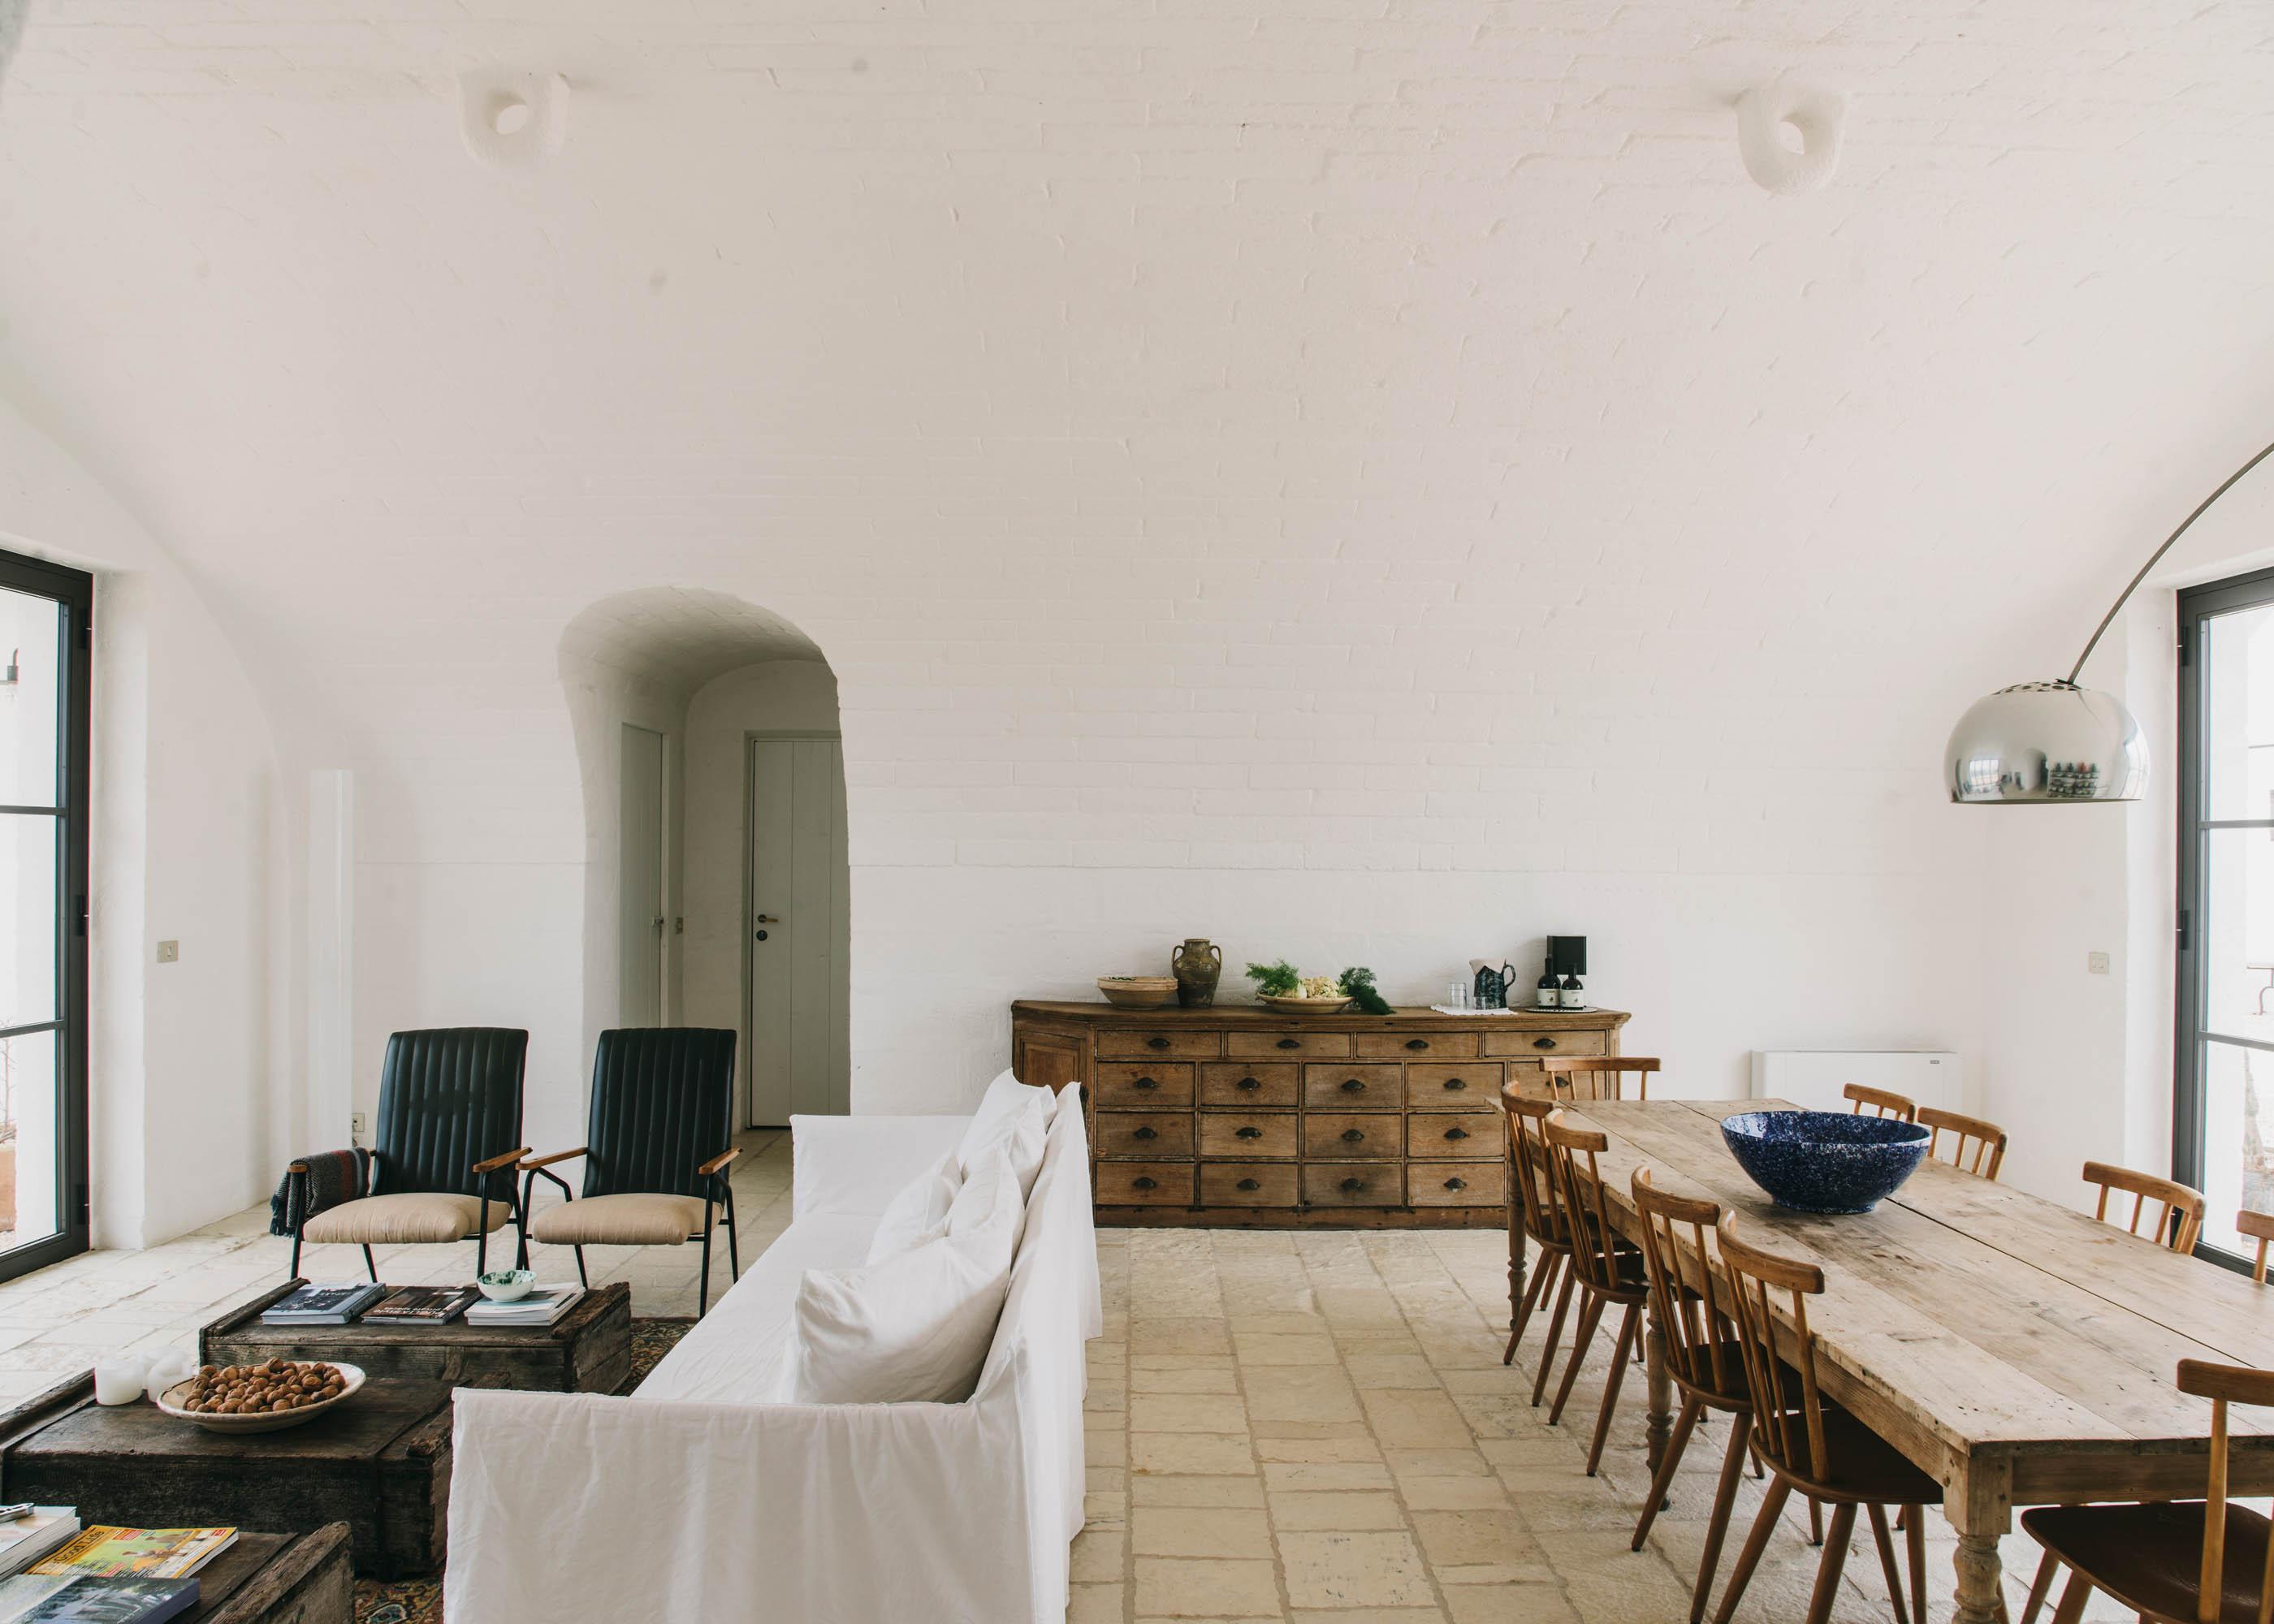 #italy #puglia #masseria #morosseta #openhouse #interiors #hotels